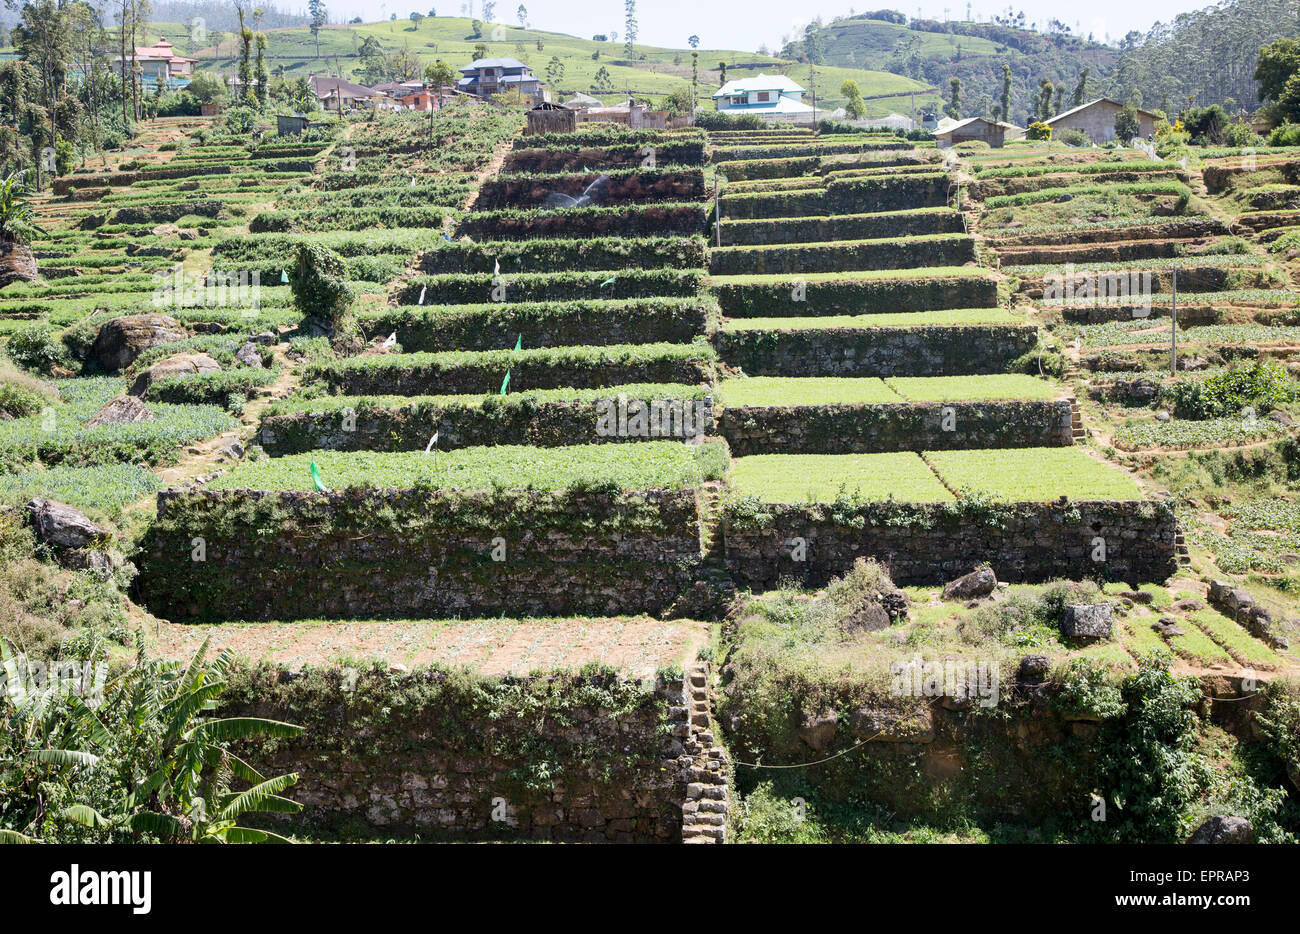 Dietas Intensivas De Cultivo De Terrazas Cerca De Nuwara